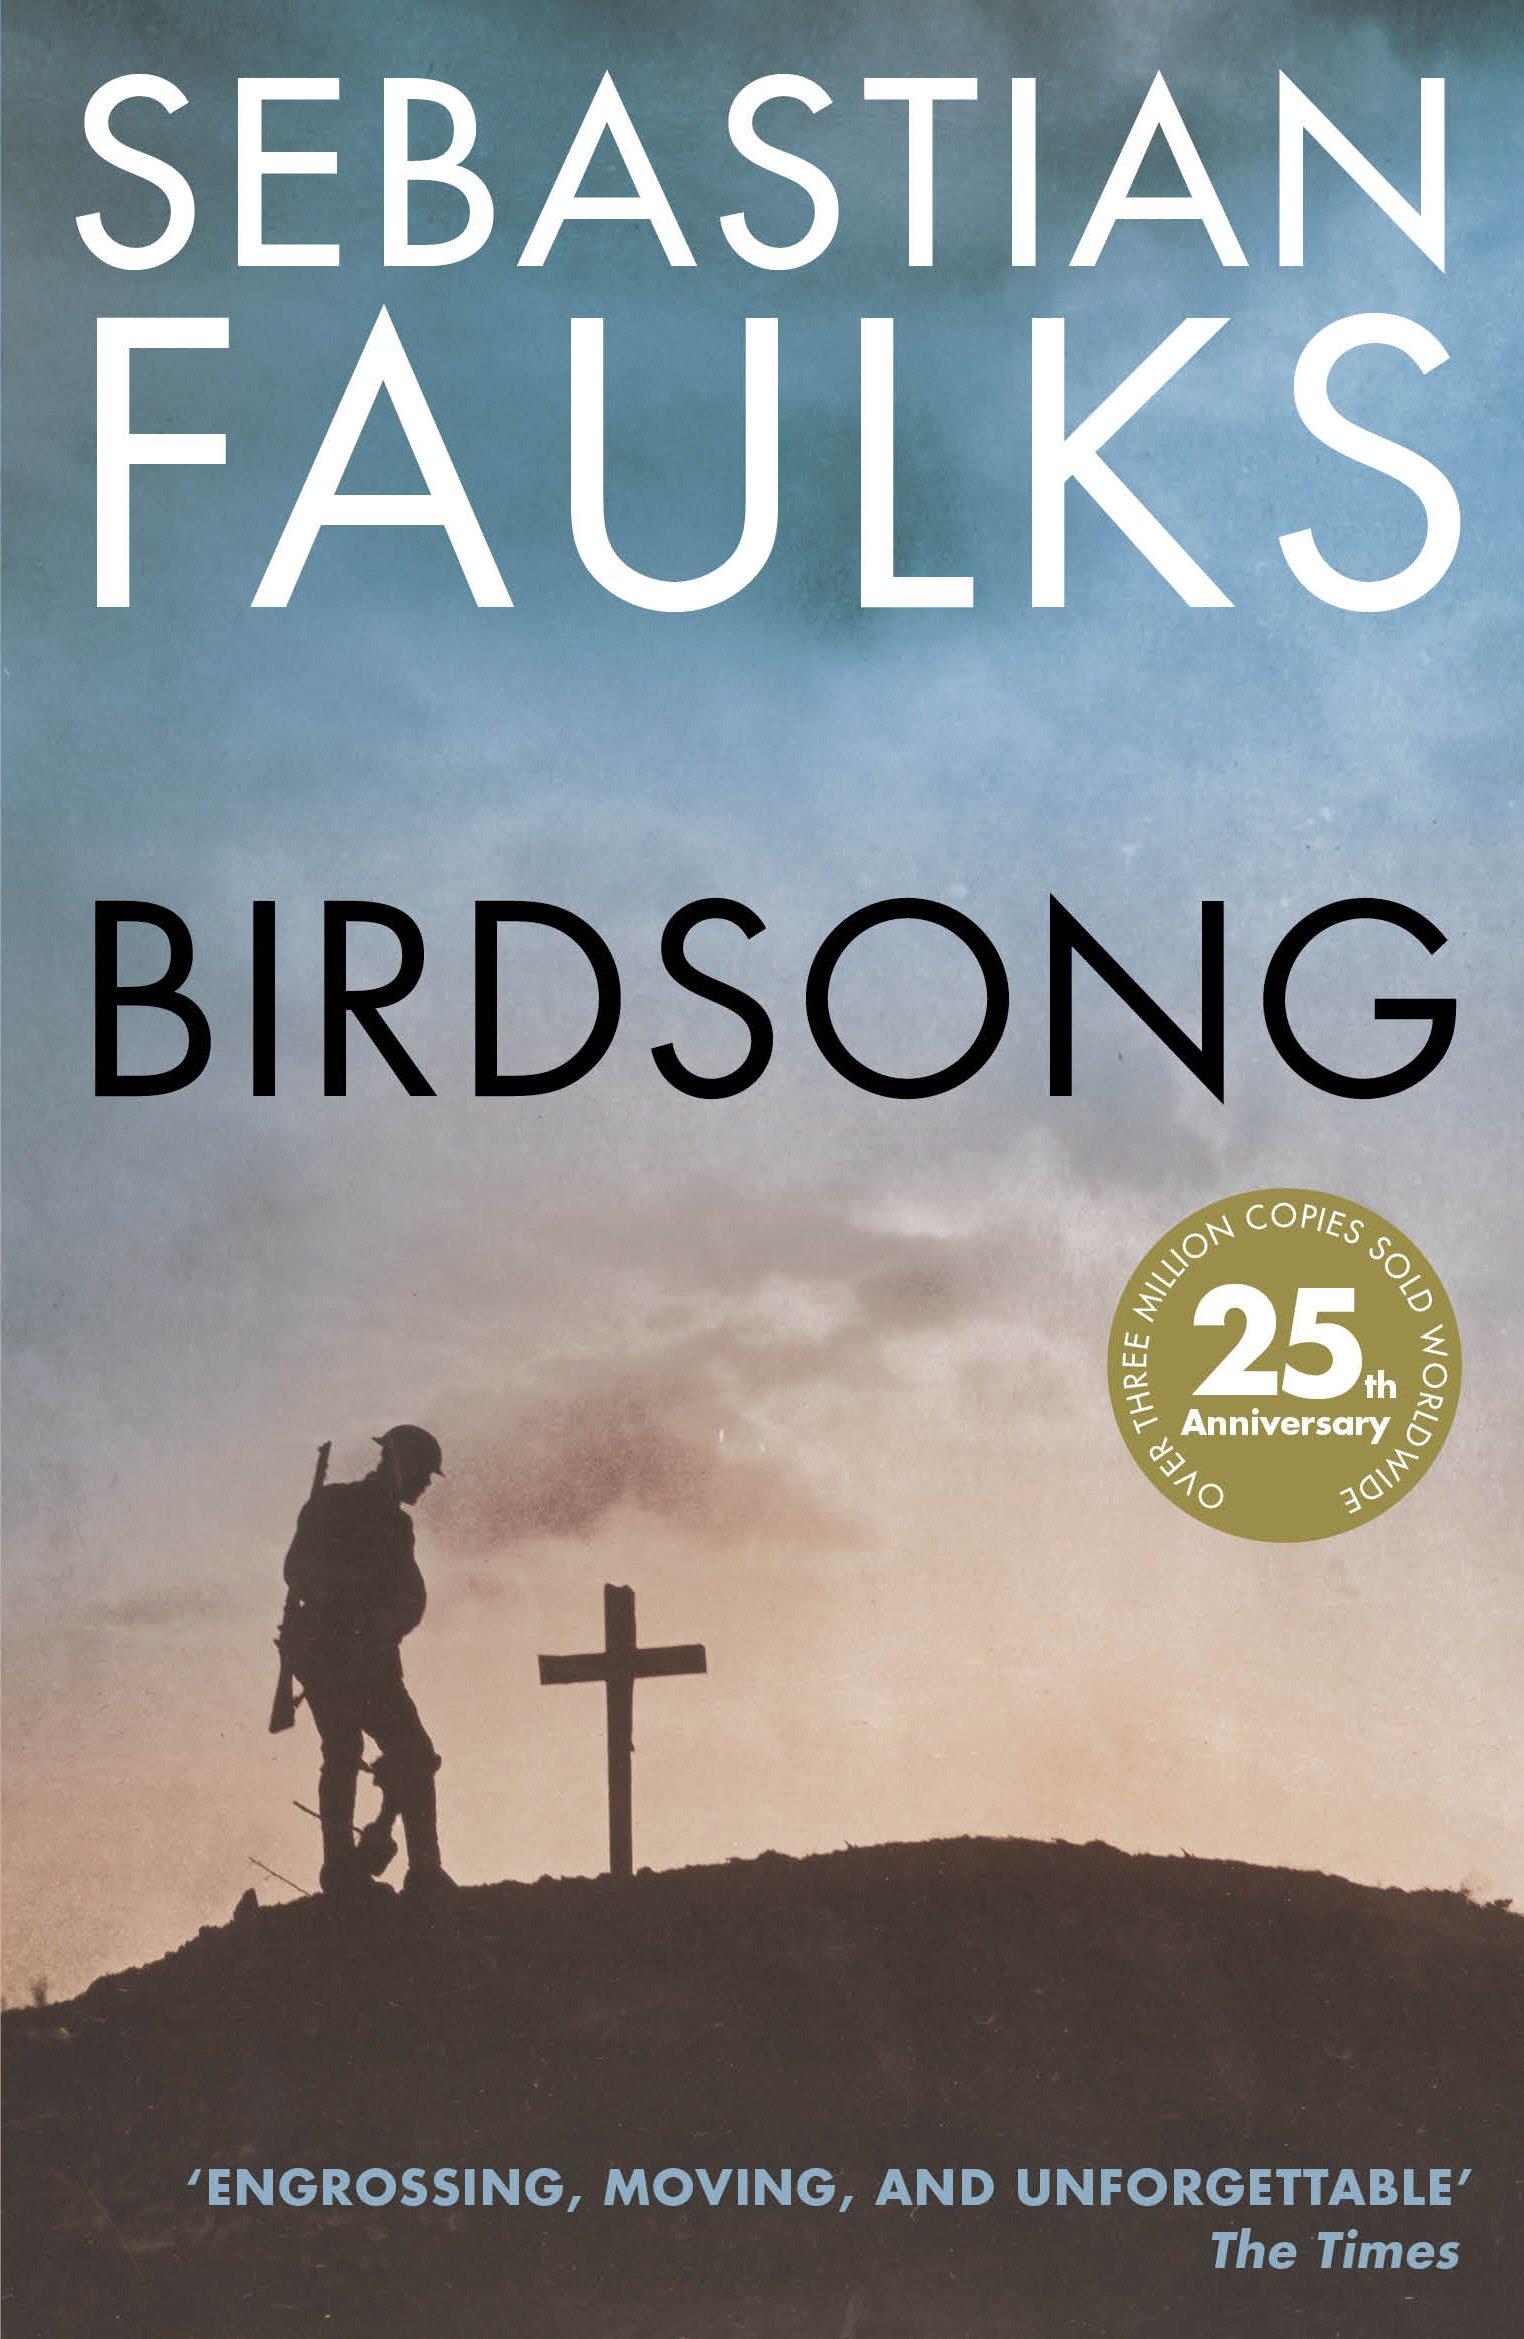 Birdsong: Amazon.co.uk: Faulks, Sebastian: 9781784700034: Books